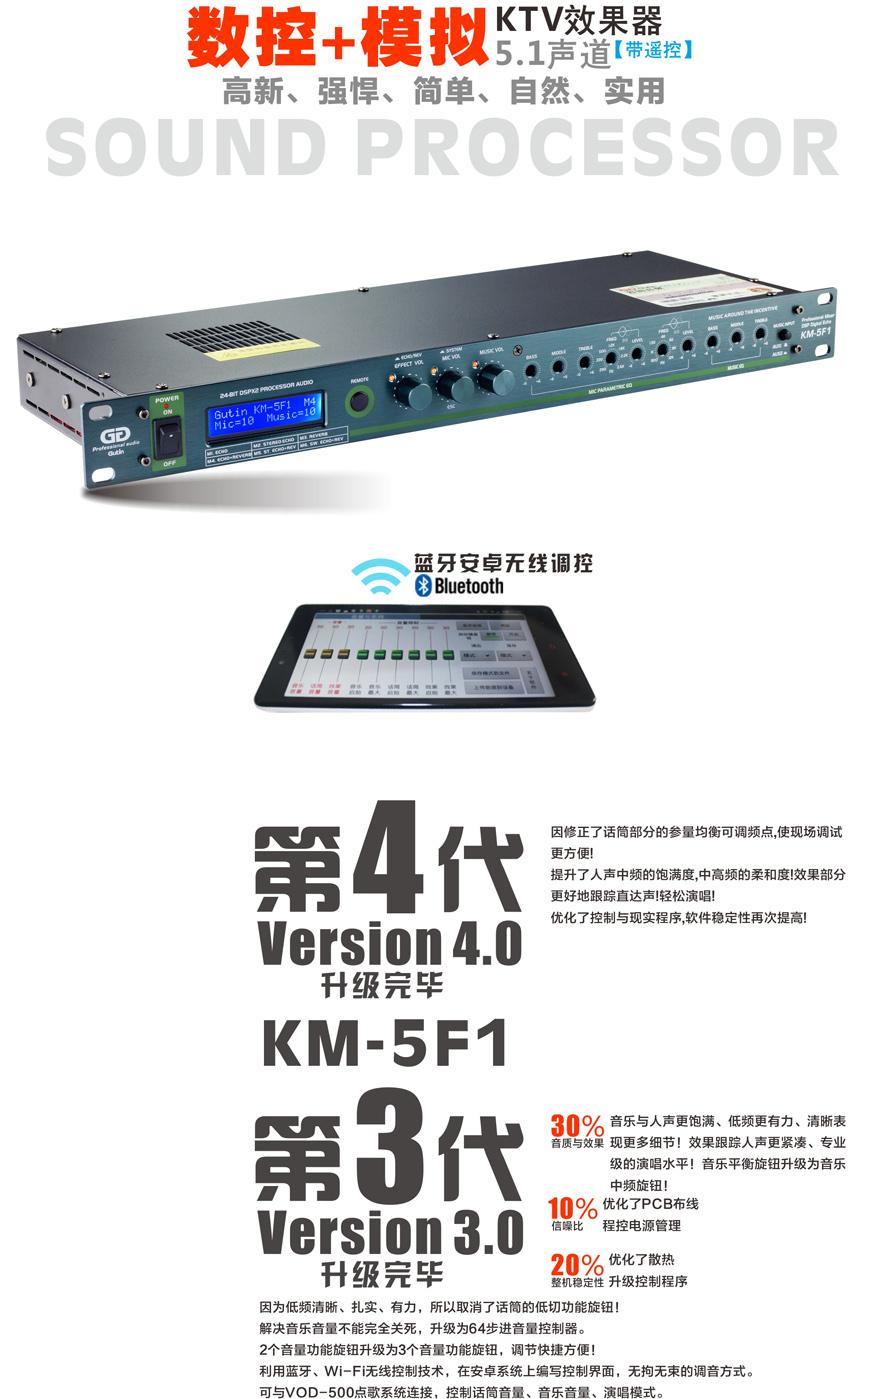 KM-5F1 initial(01)